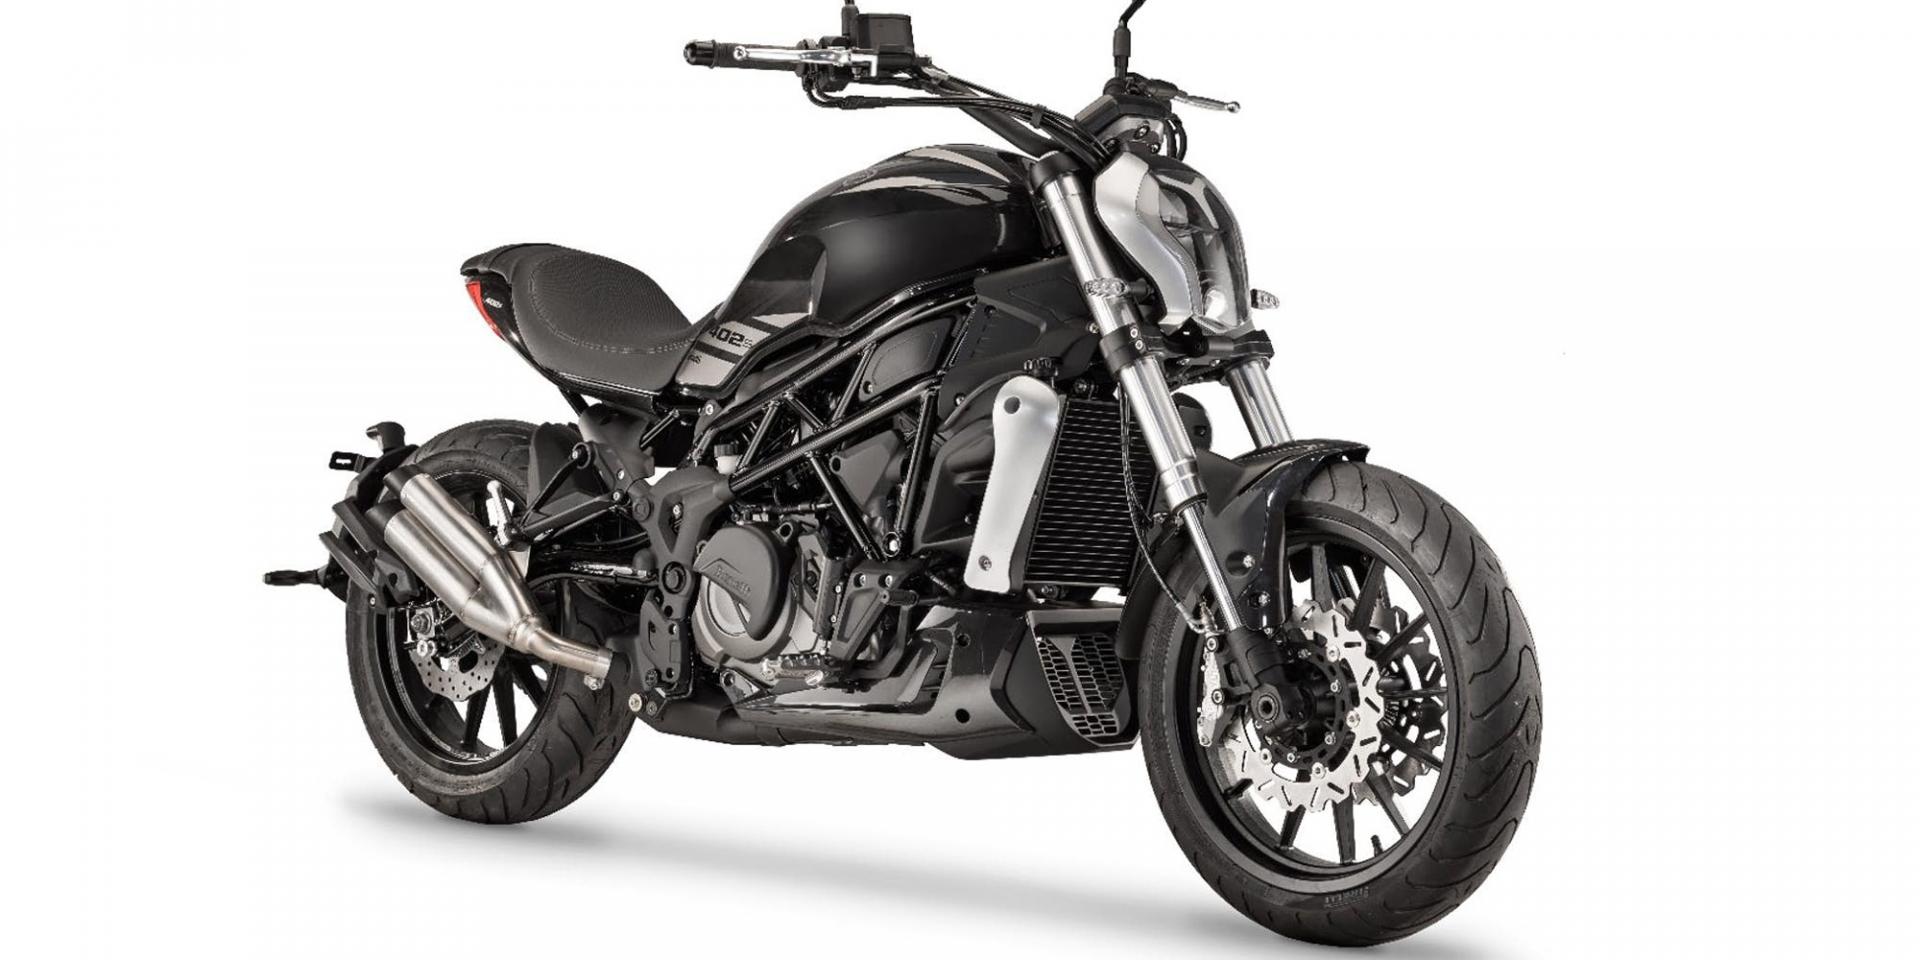 強國無極限,Ducati XDiavel的複製人Benelli 402 S